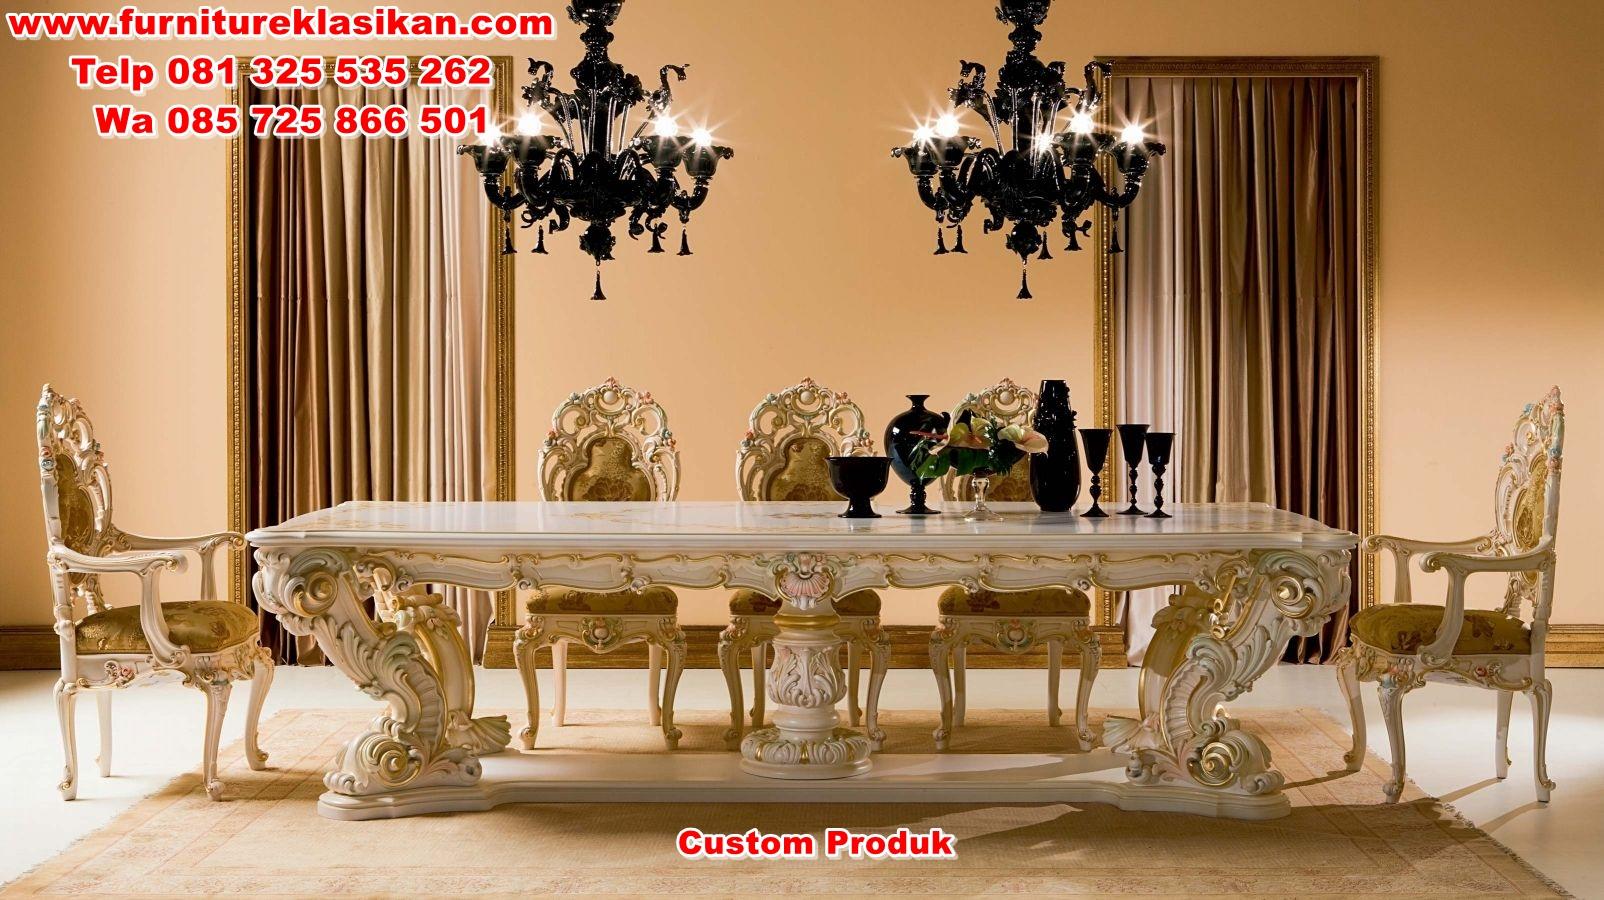 luxury-dinning-table-design-witg-good-good-carving set kursi meja makan klasik mewah